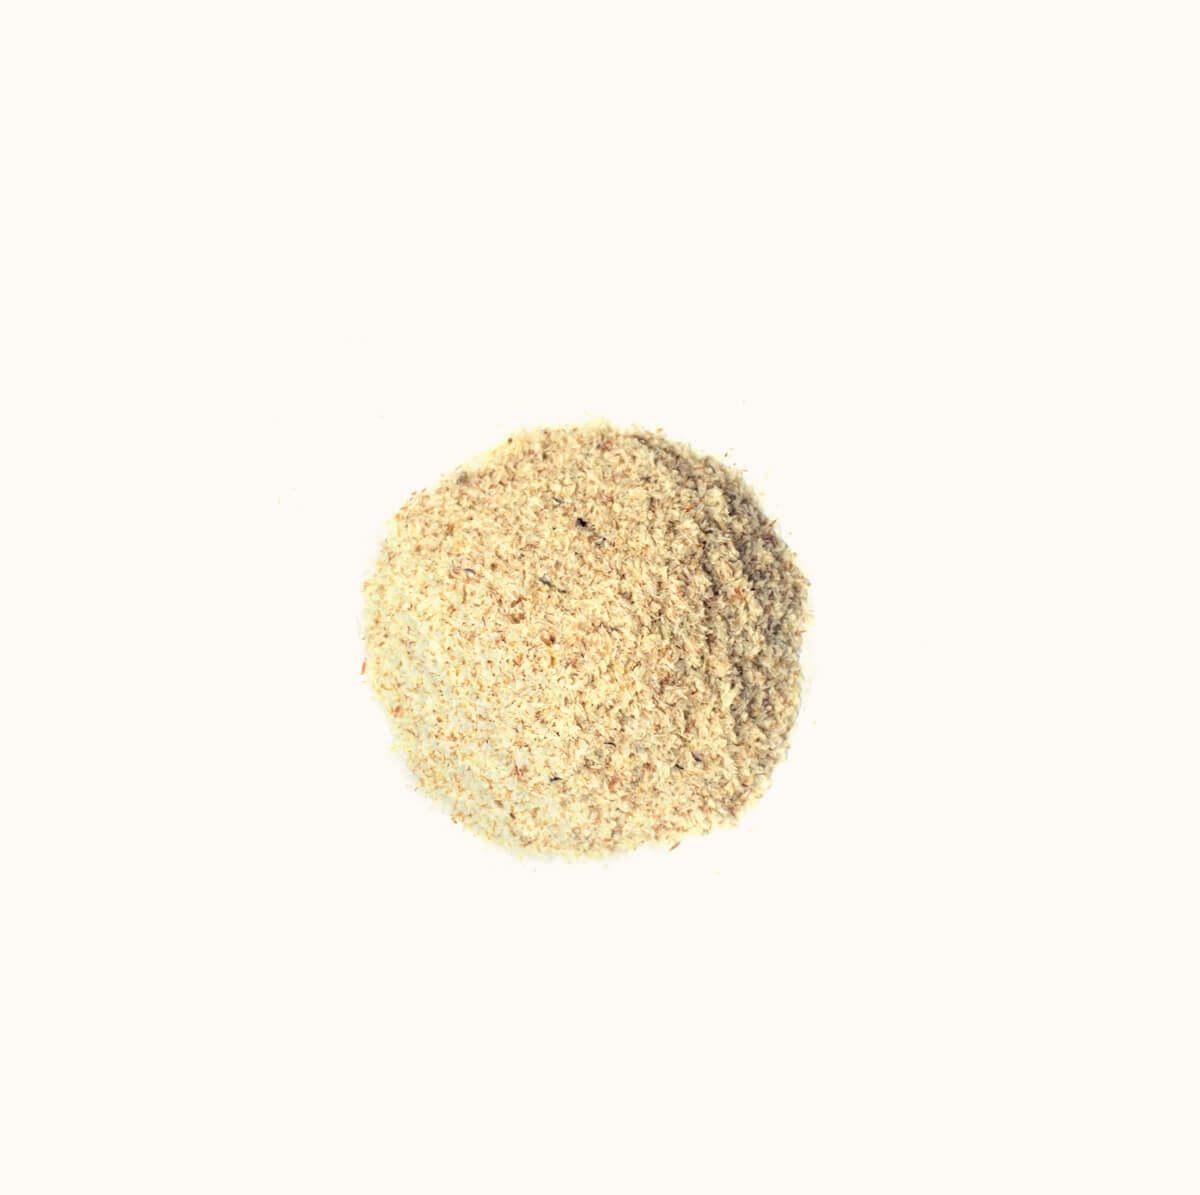 PSYLLIUM - Plantago psyllium - 100g